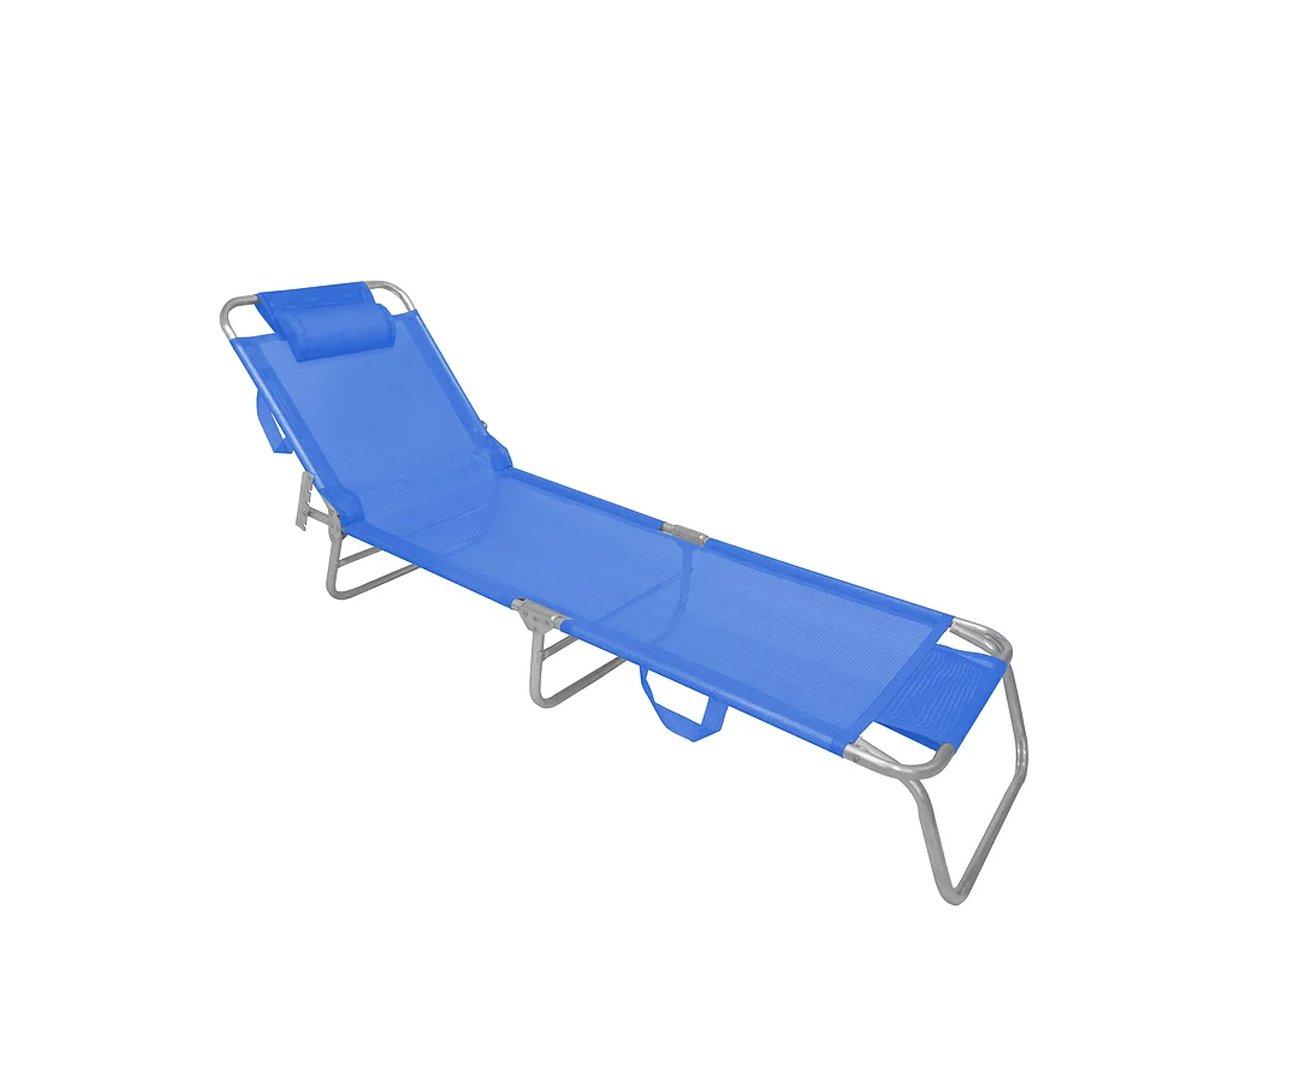 Espreguiçadeira Aluminio Zaka Slim Azul Capacidade 100kg